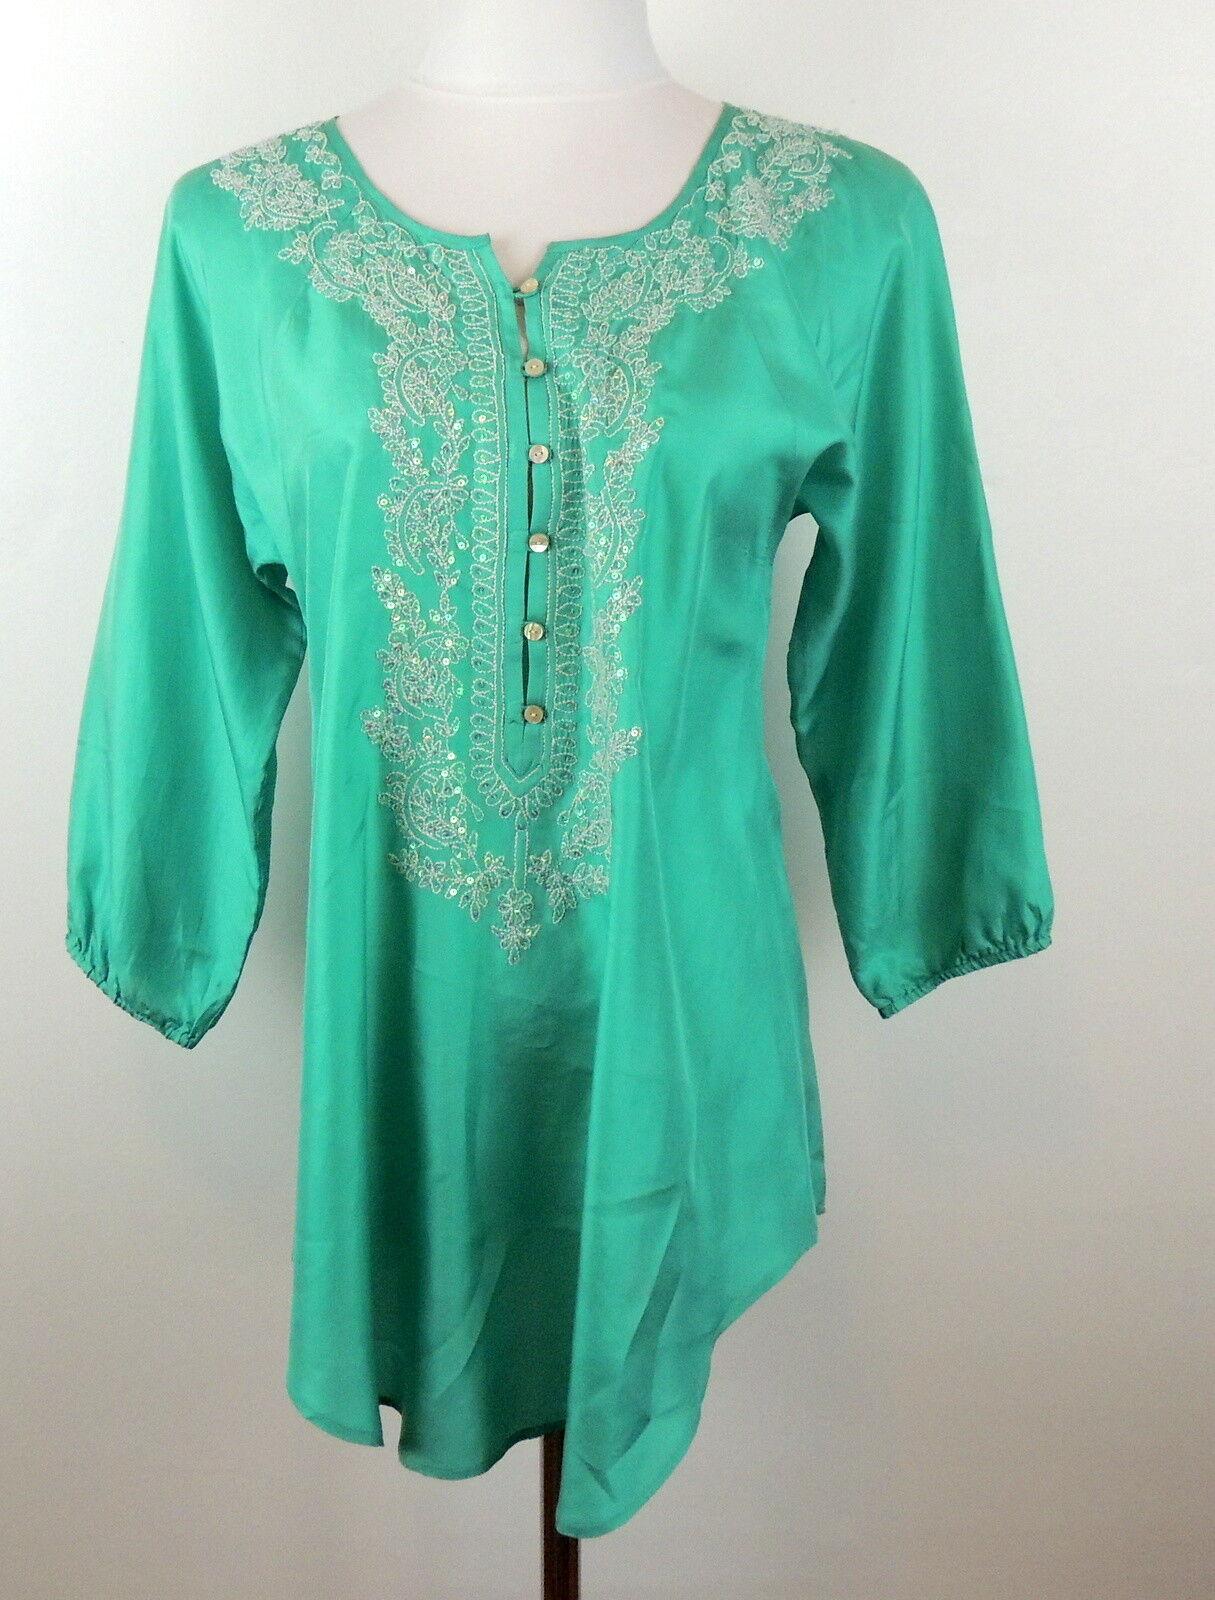 Calypso St. Barth 0 Romantic Silk Tunic Blouse Aqua & Sequin Sparkle Detail Top